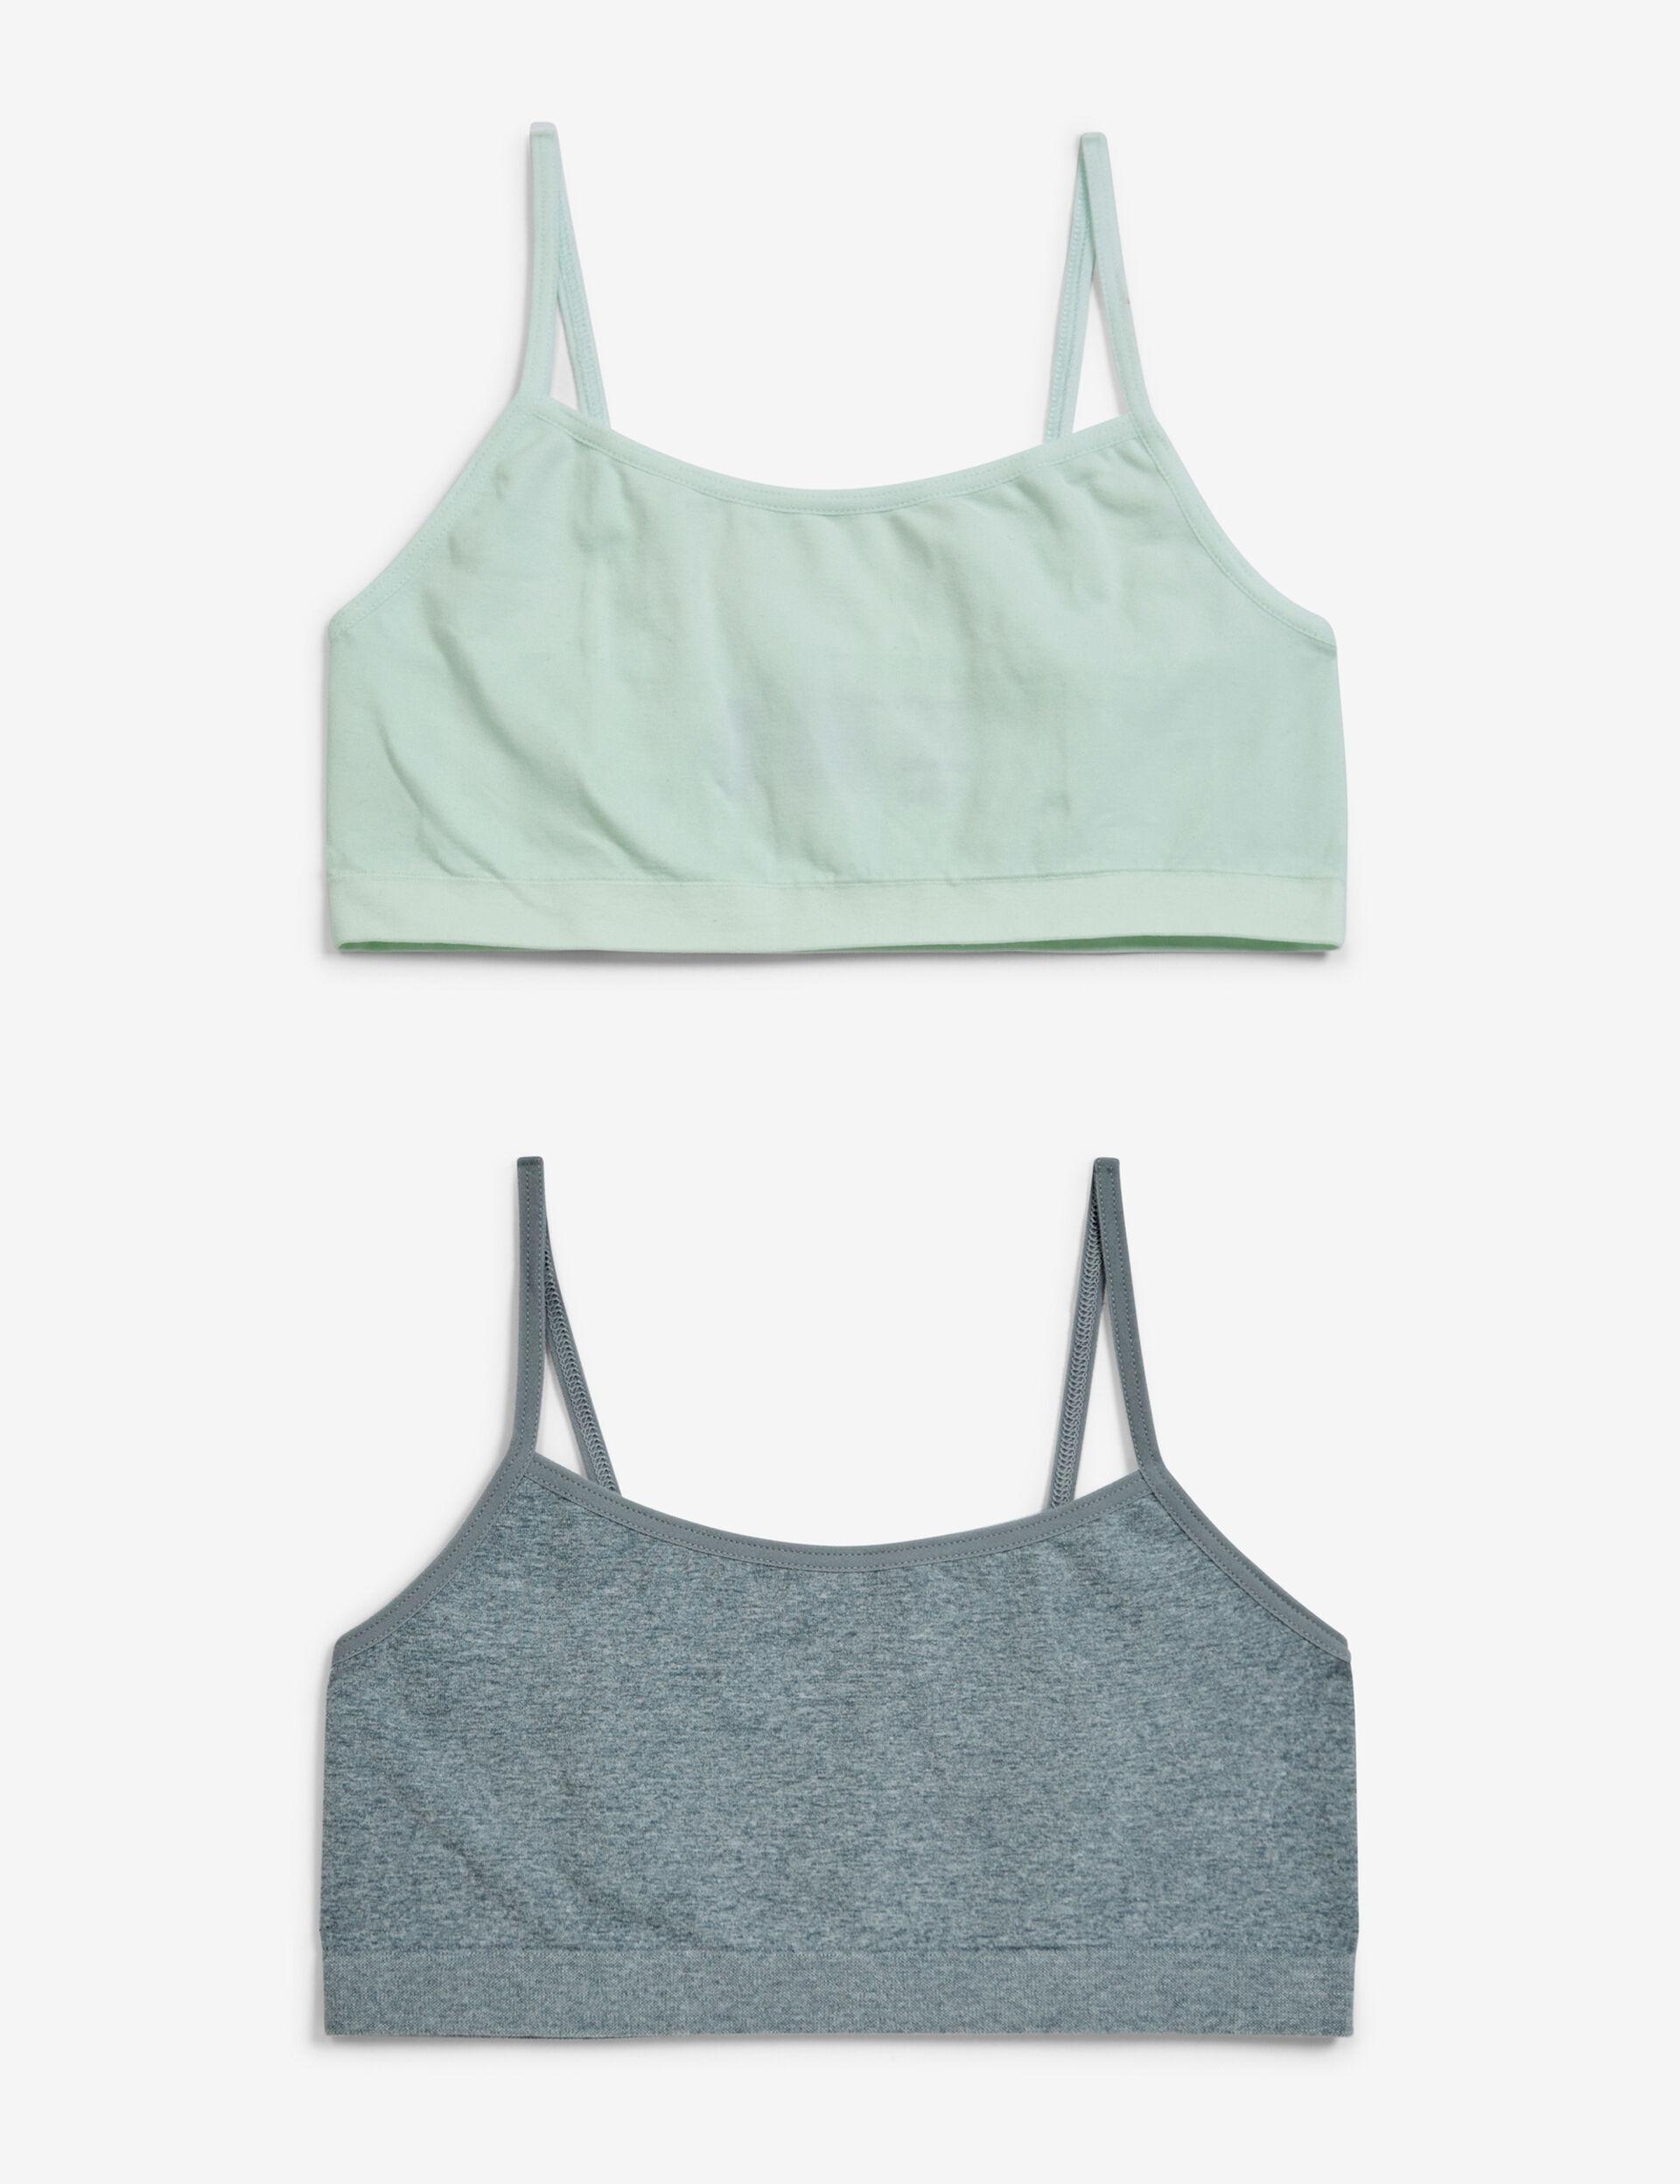 Basic bras